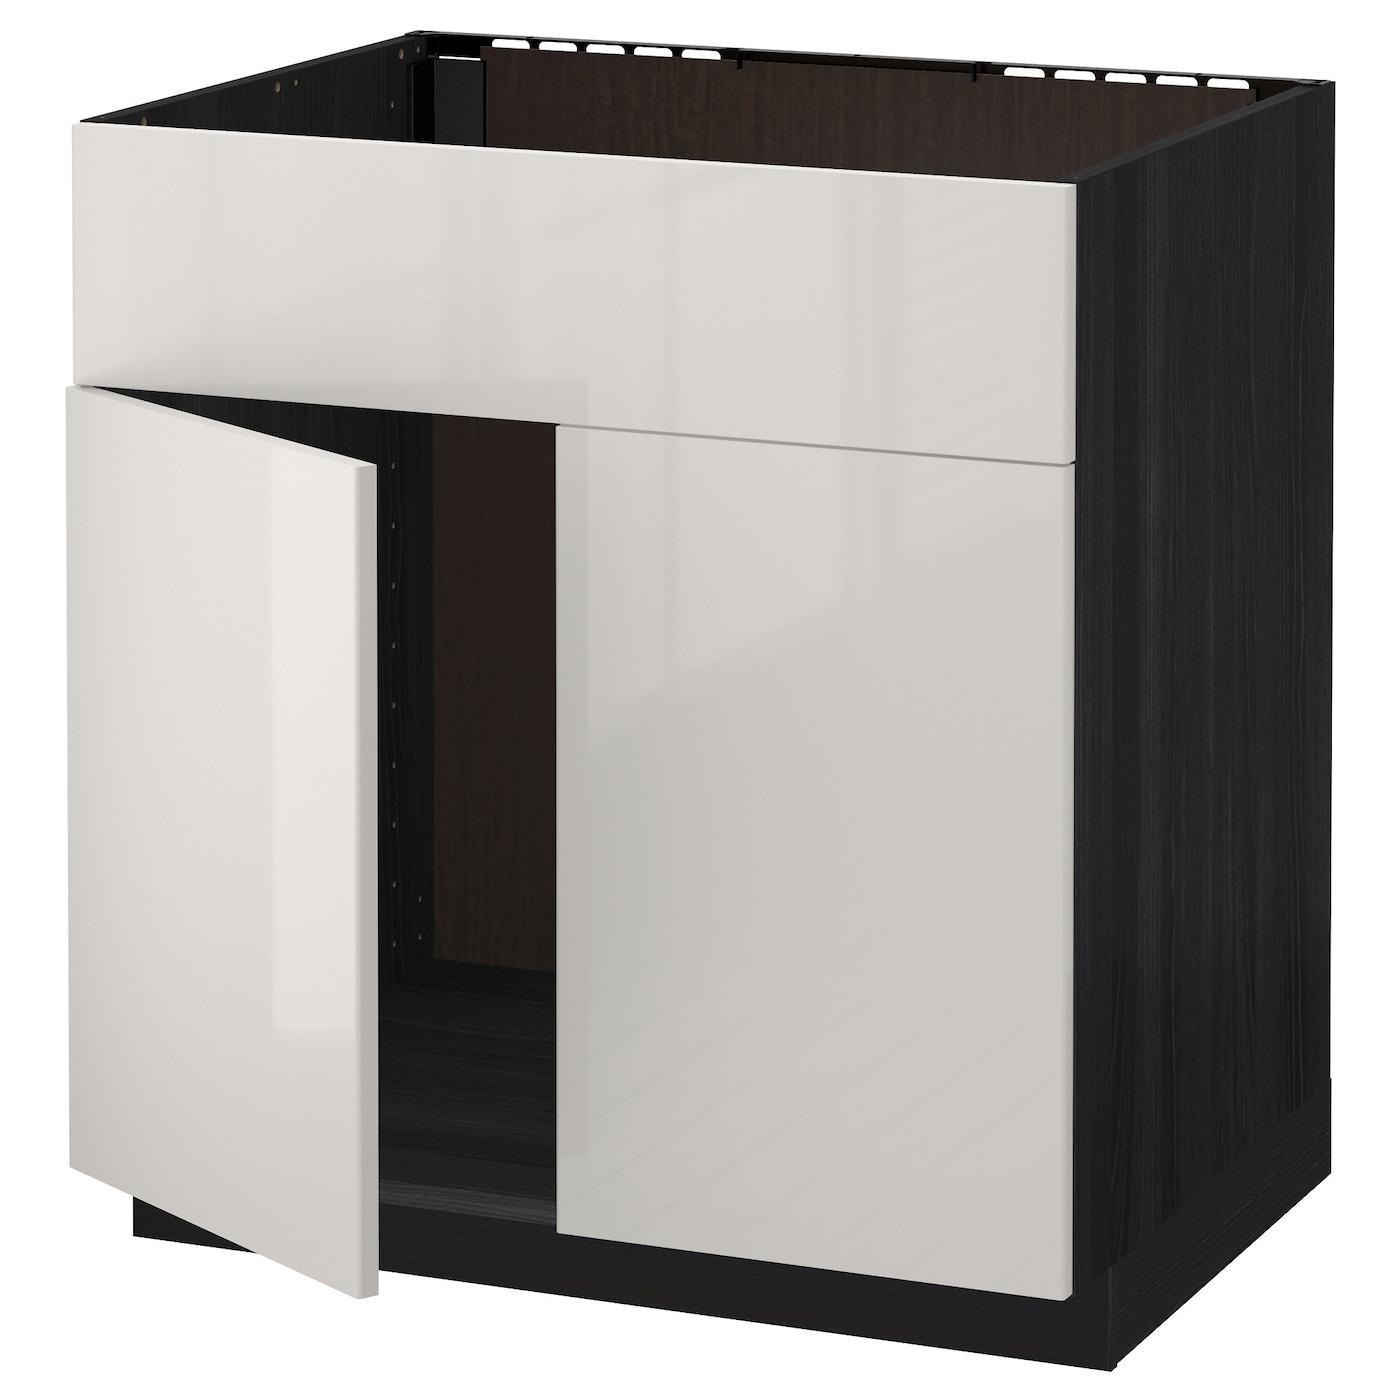 Ikea Kitchen Cabinet Construction: METOD Base Cabinet F Sink W 2 Doors/front Black/ringhult